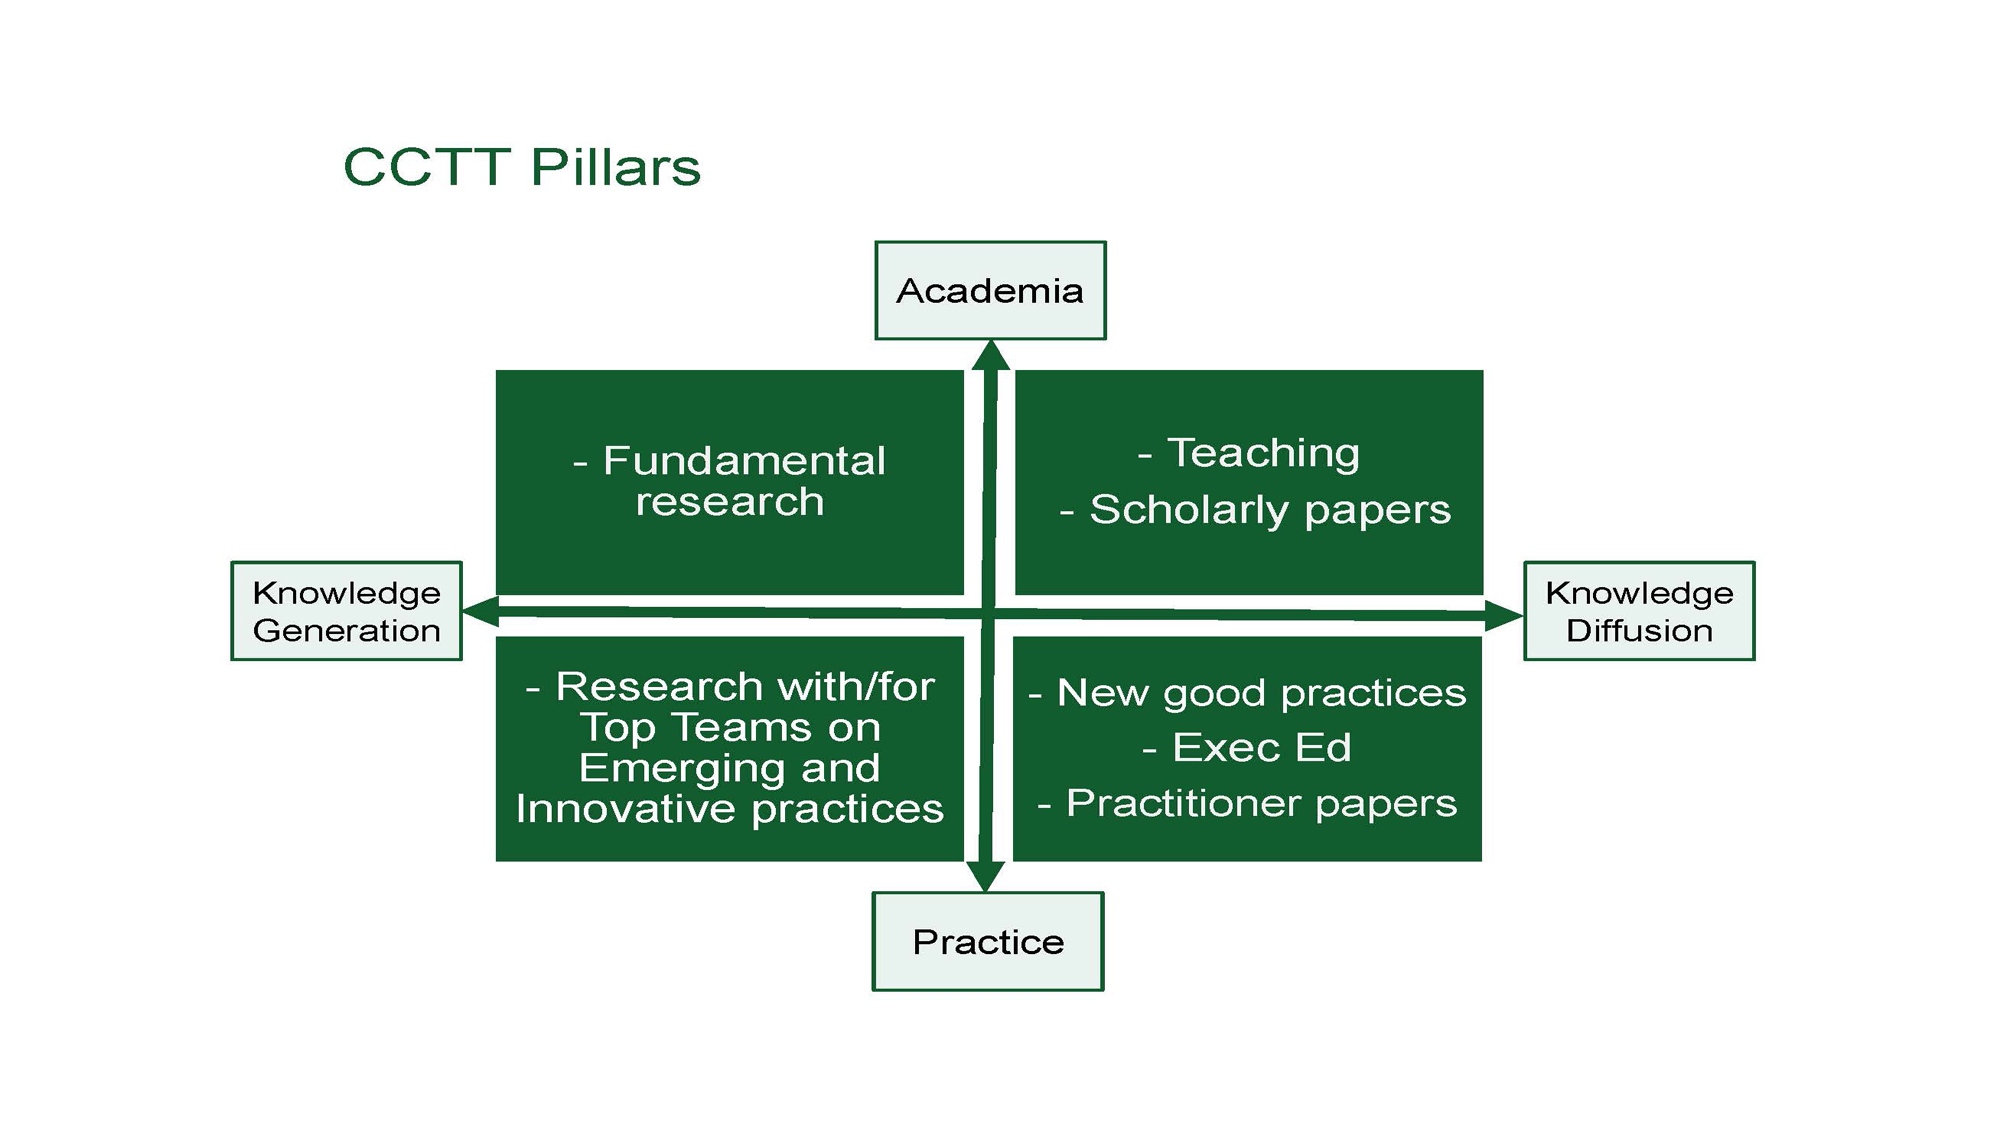 Graphic of the SGTT Pillars: Acadamia, knowledge diffusion, practice, knowledge generation